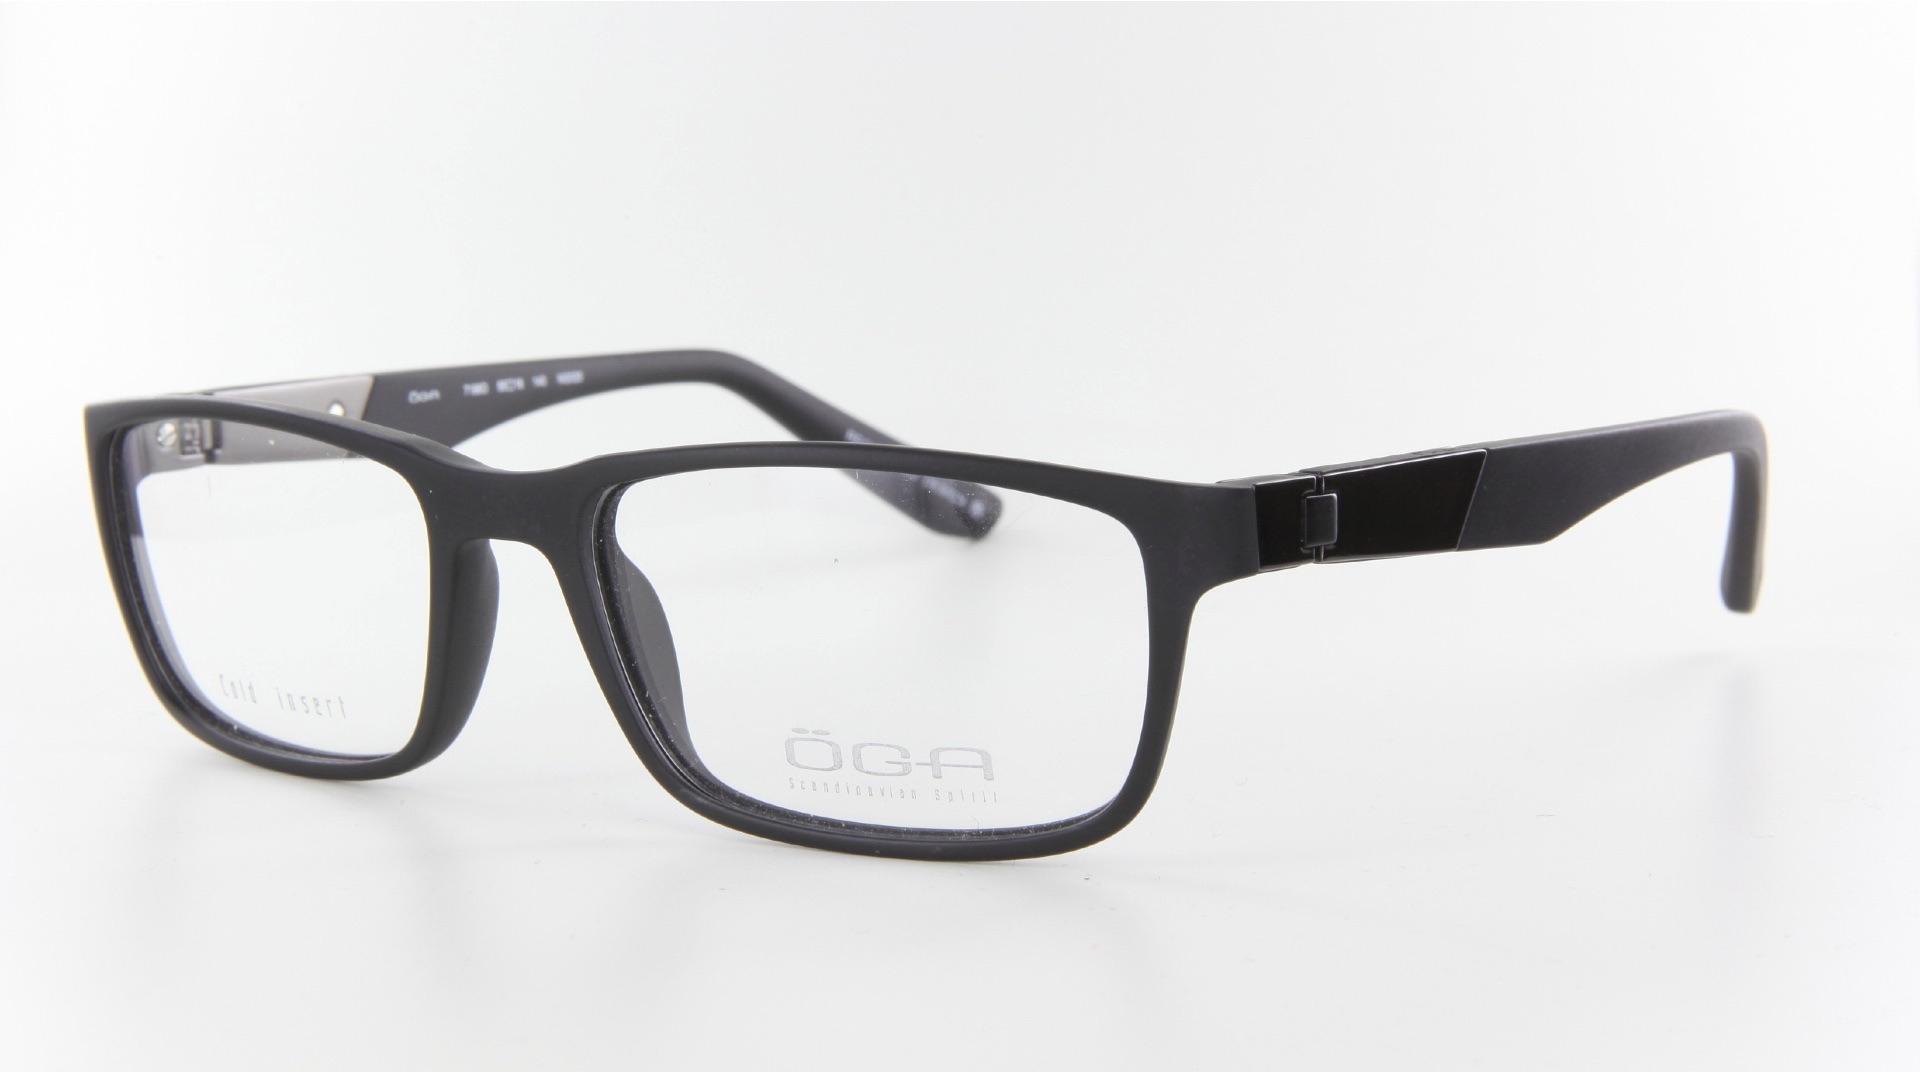 OGA - ref: 68548